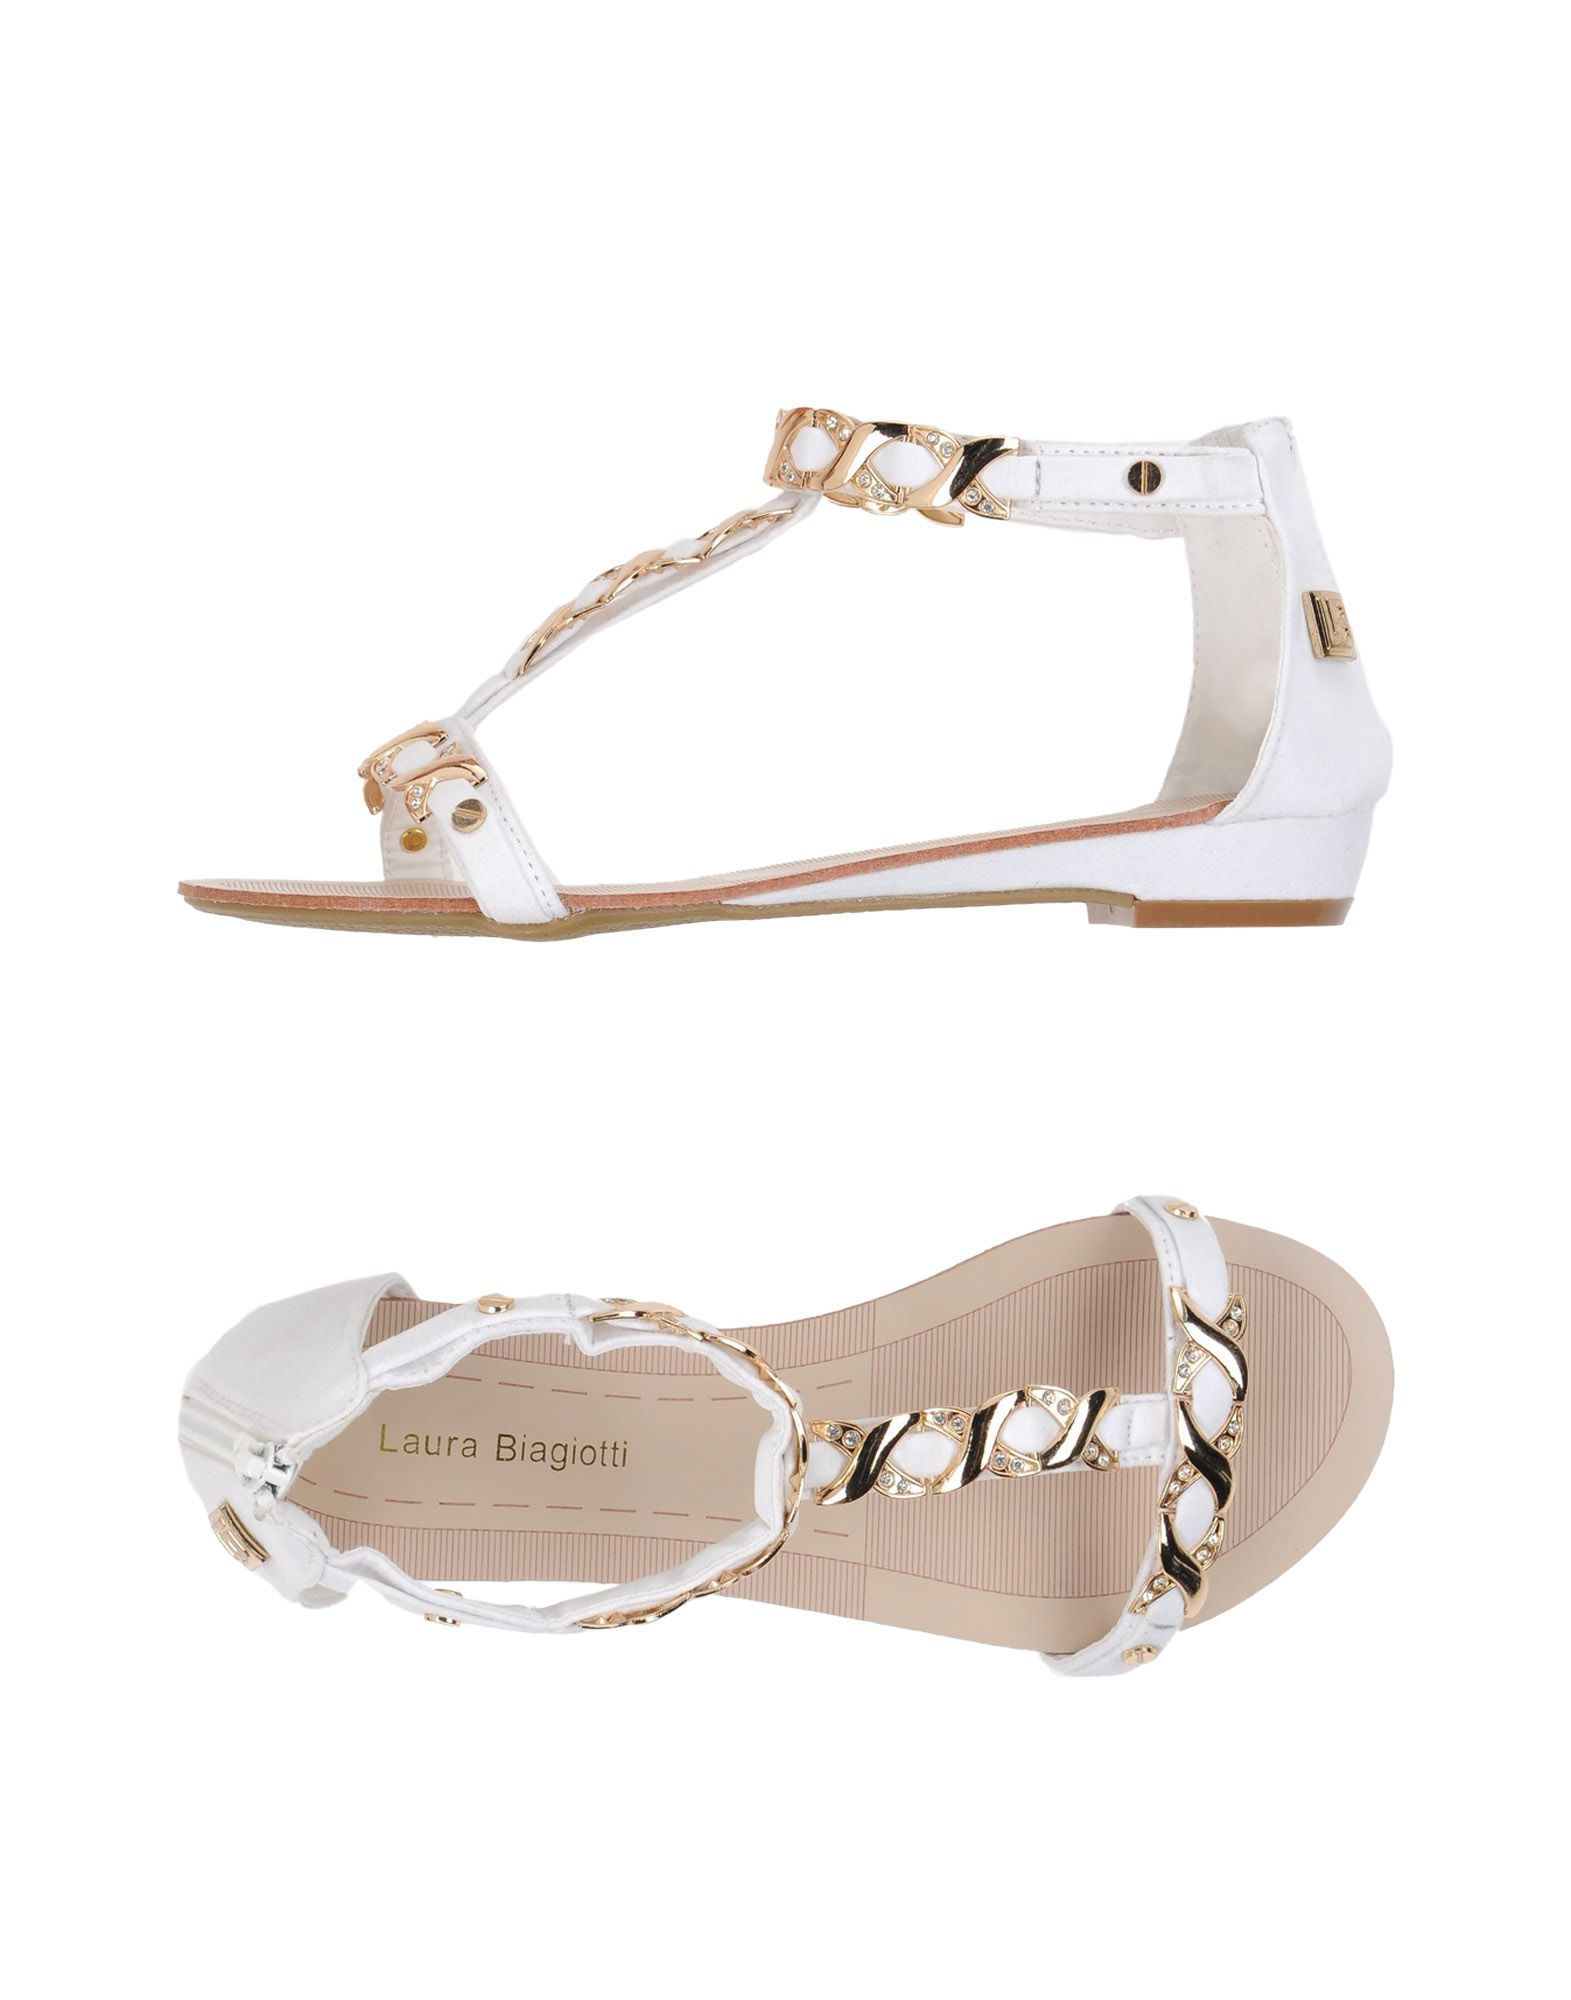 Laura Biagiotti Sandalen Damen  11373576JN Gute Qualität beliebte Schuhe